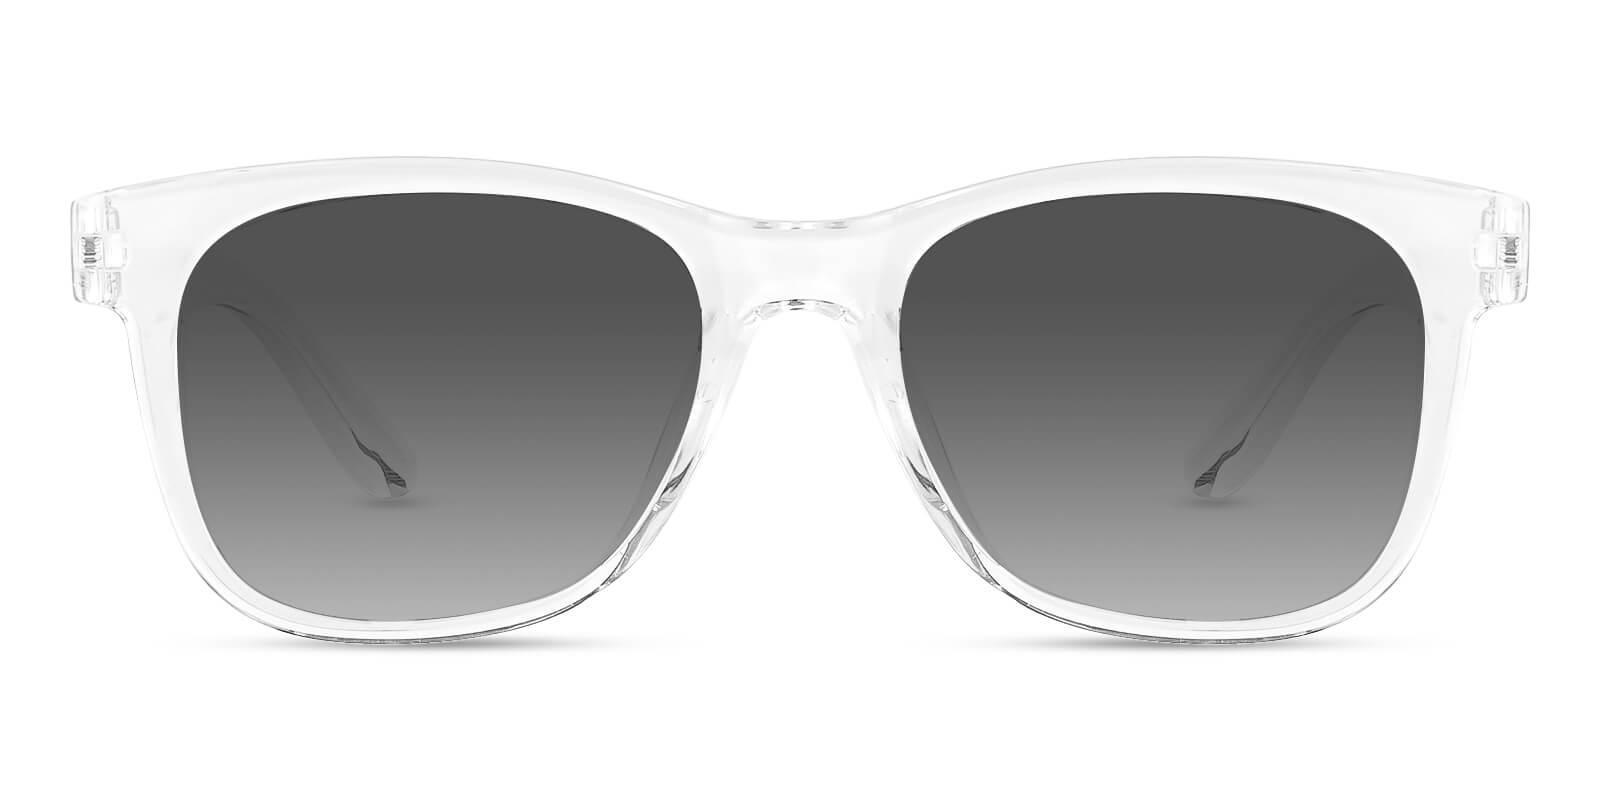 Symmetry Translucent TR Sunglasses , UniversalBridgeFit Frames from ABBE Glasses